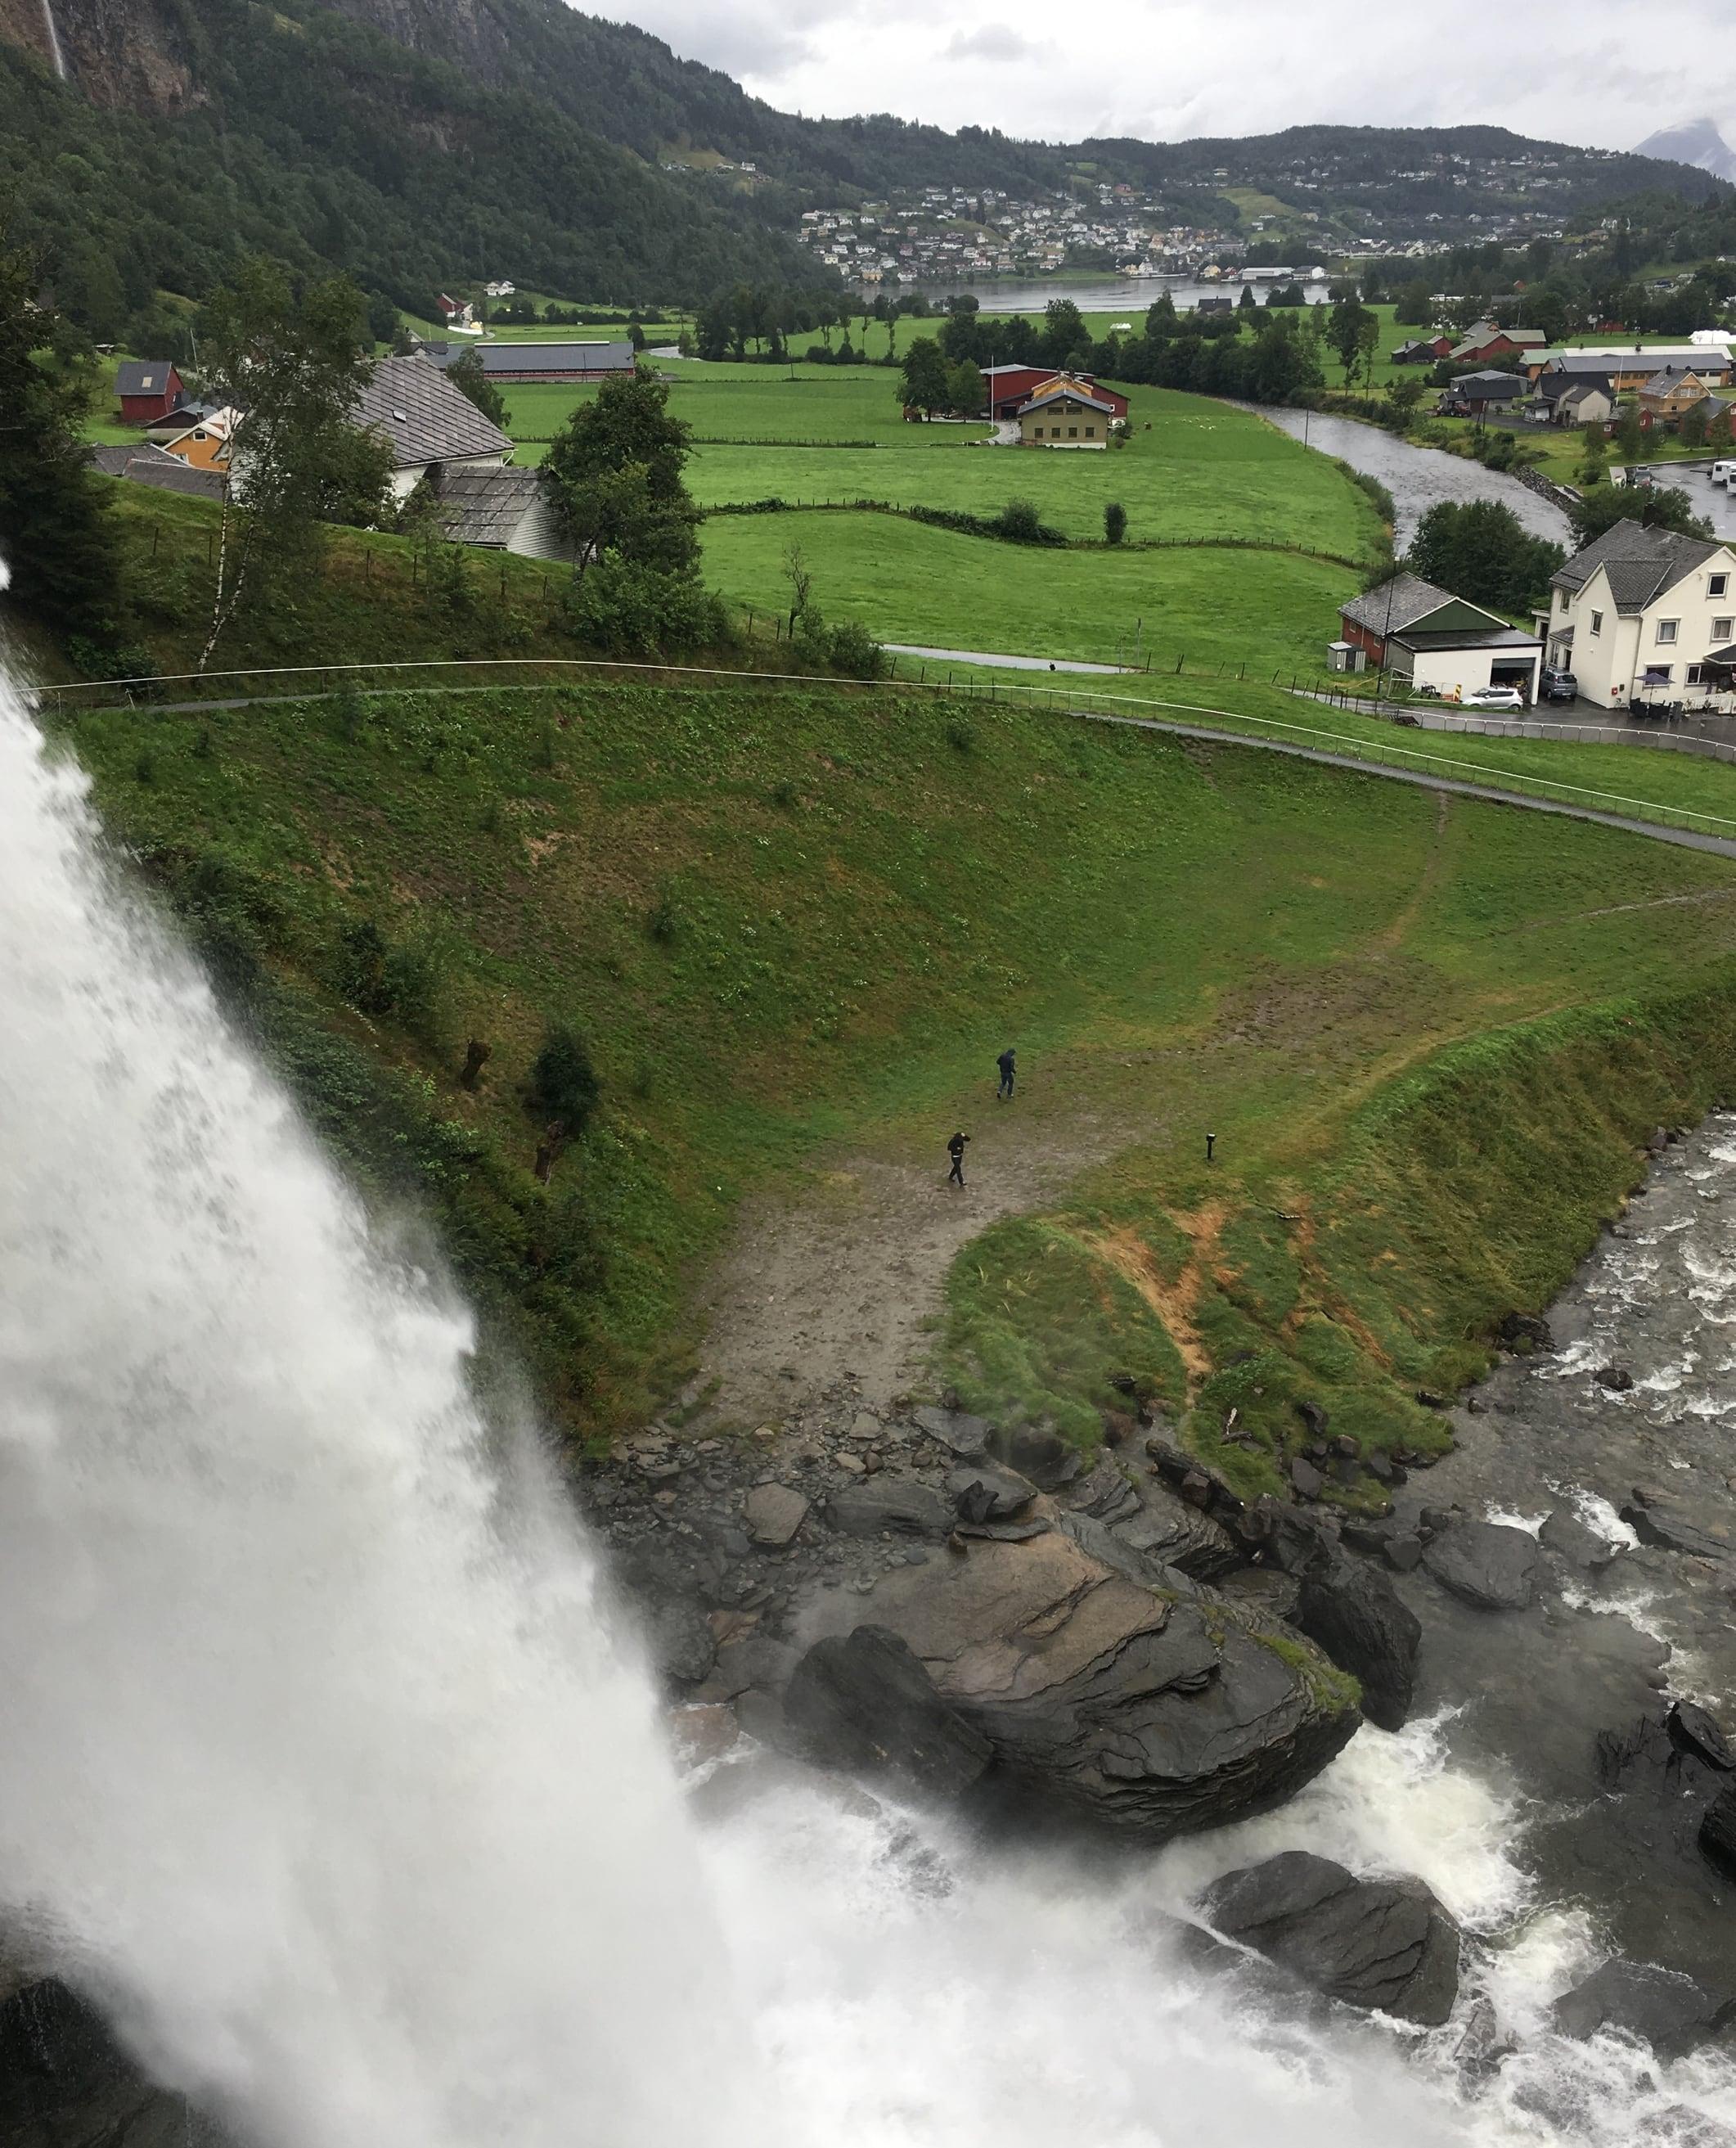 The rushing water at Steinsdalsfossen